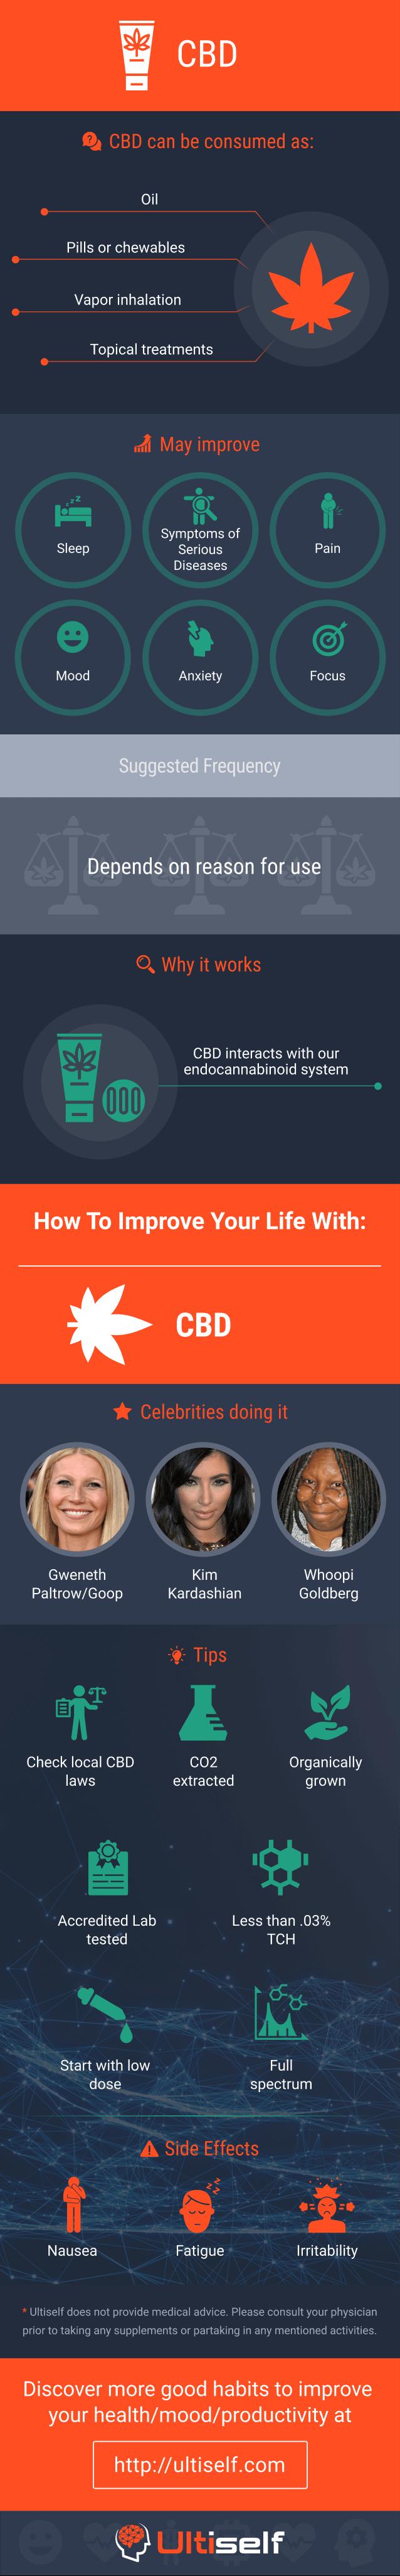 CBD infographic